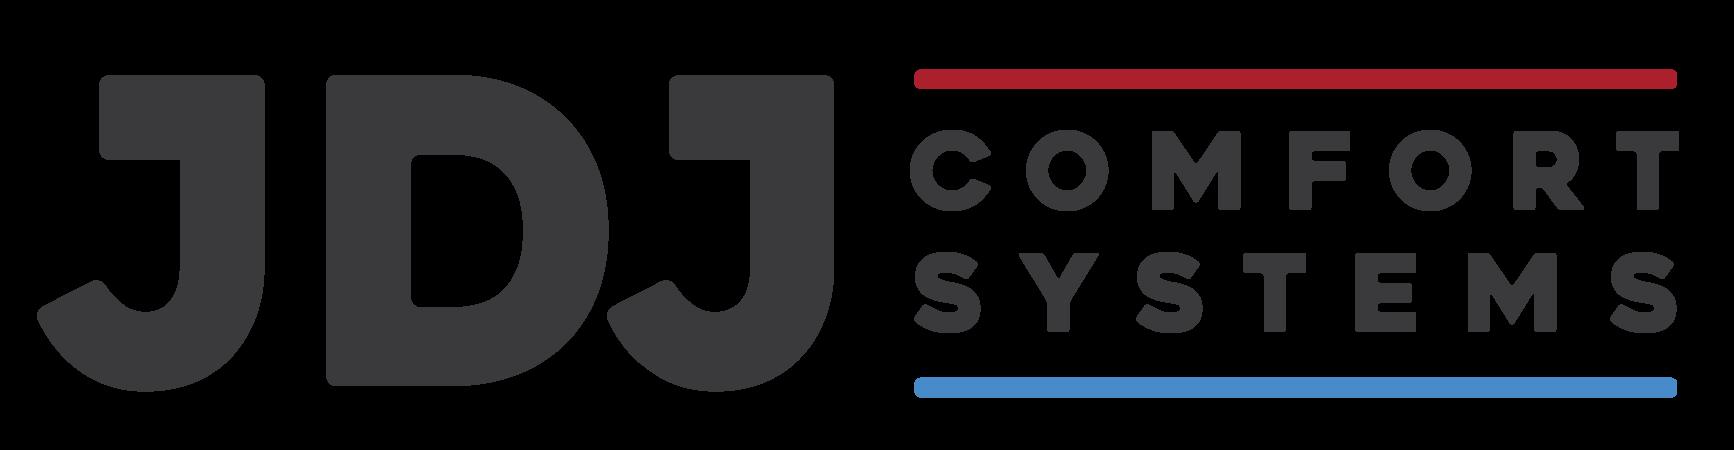 JDJ Home Comfort Logo